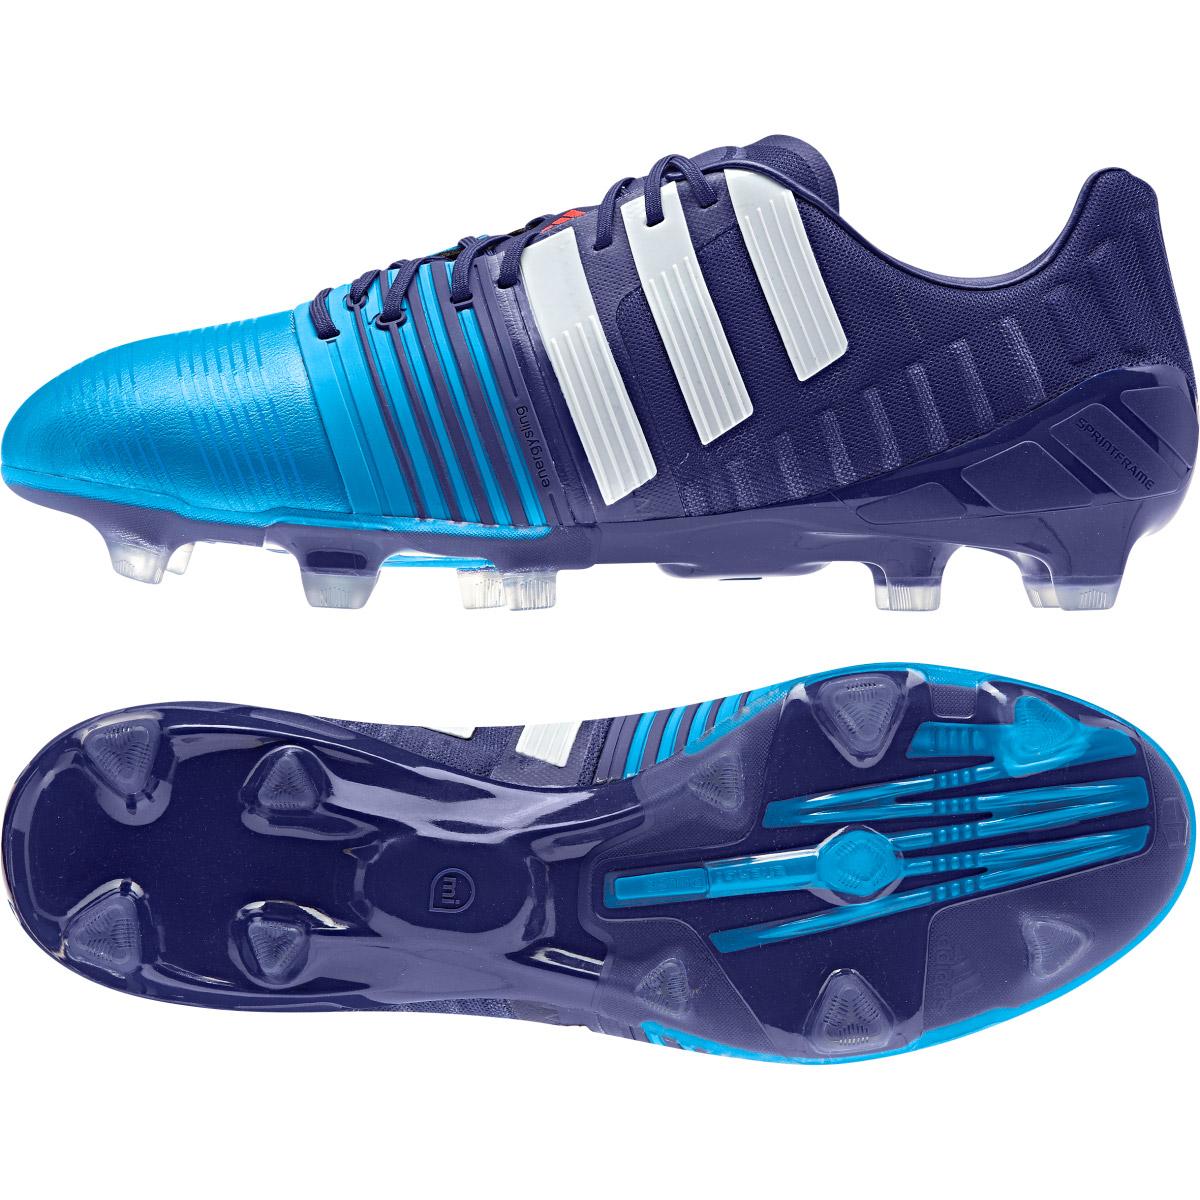 Adidas Nitrocharge 1.0 Firm Ground Football Boots Purple